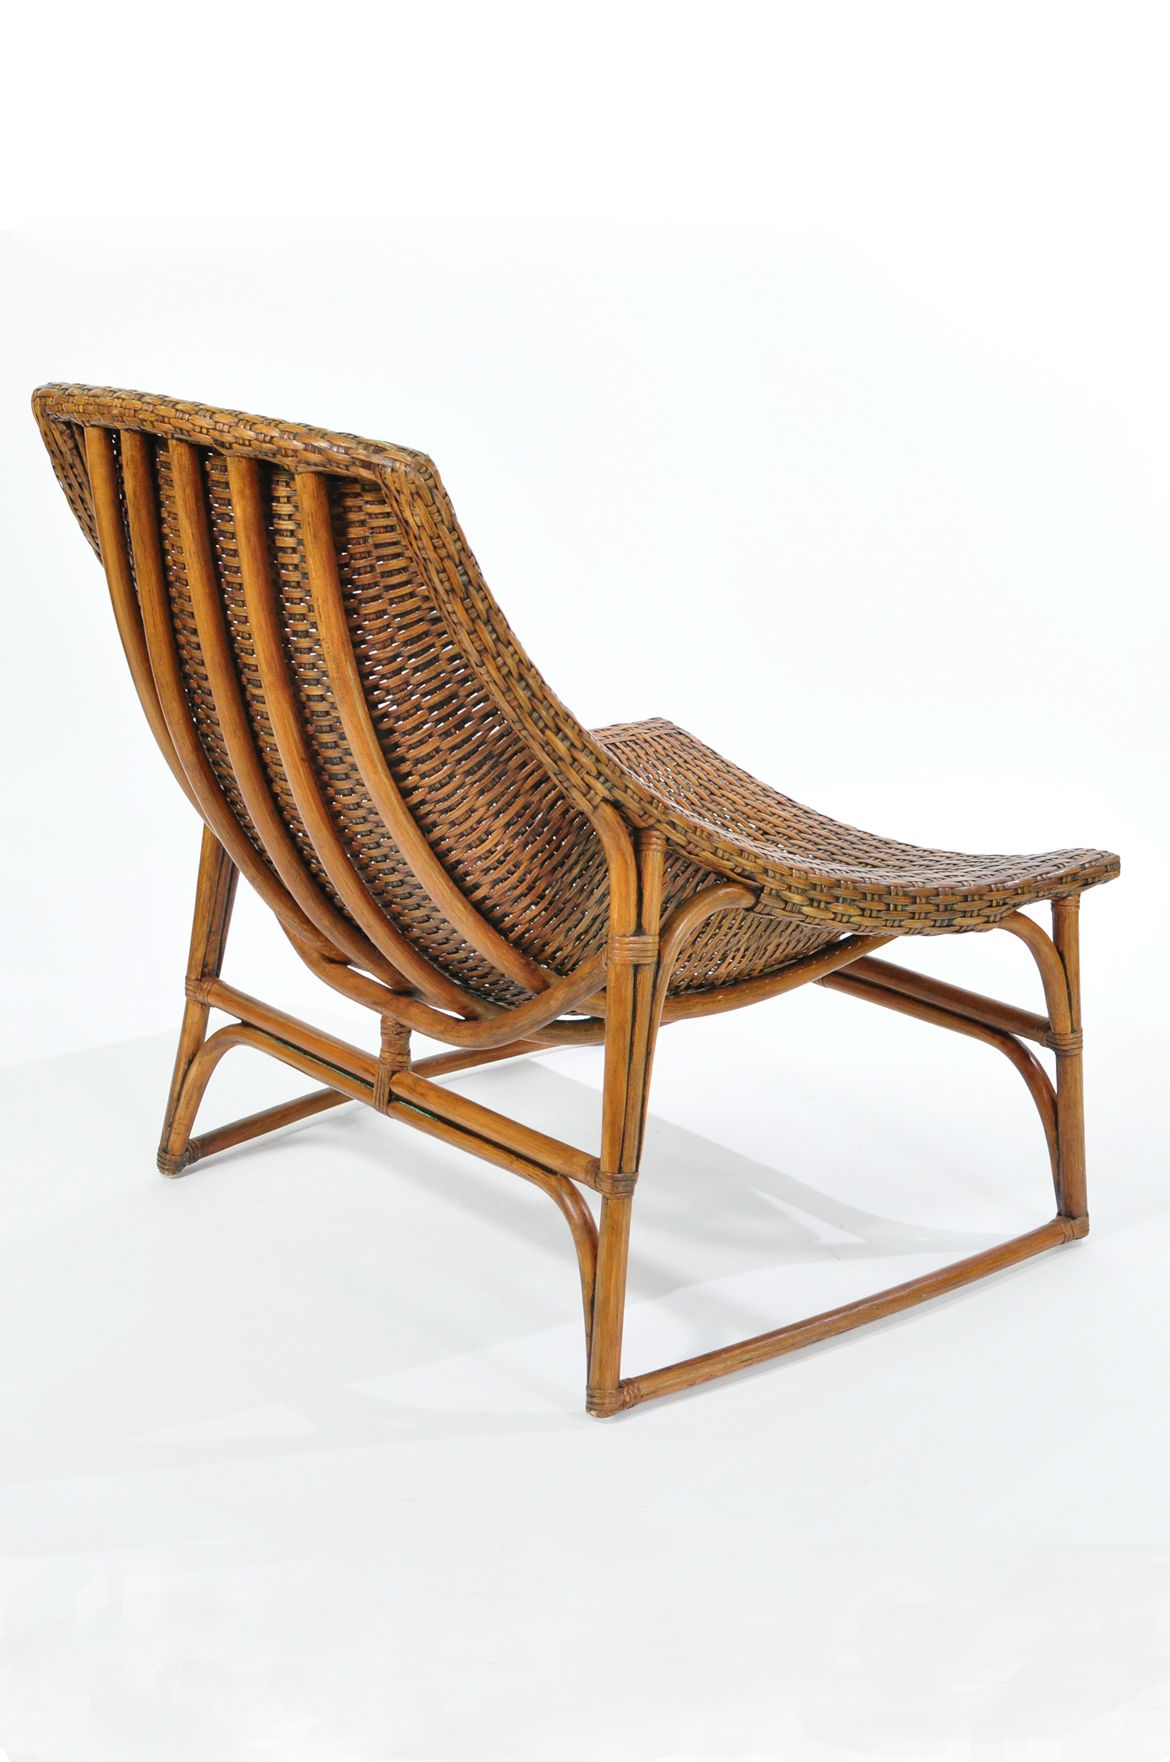 Childs Rattan Chair Roman Back Extension Hammock Cane Chairs Wicker Child Rocking Verandah